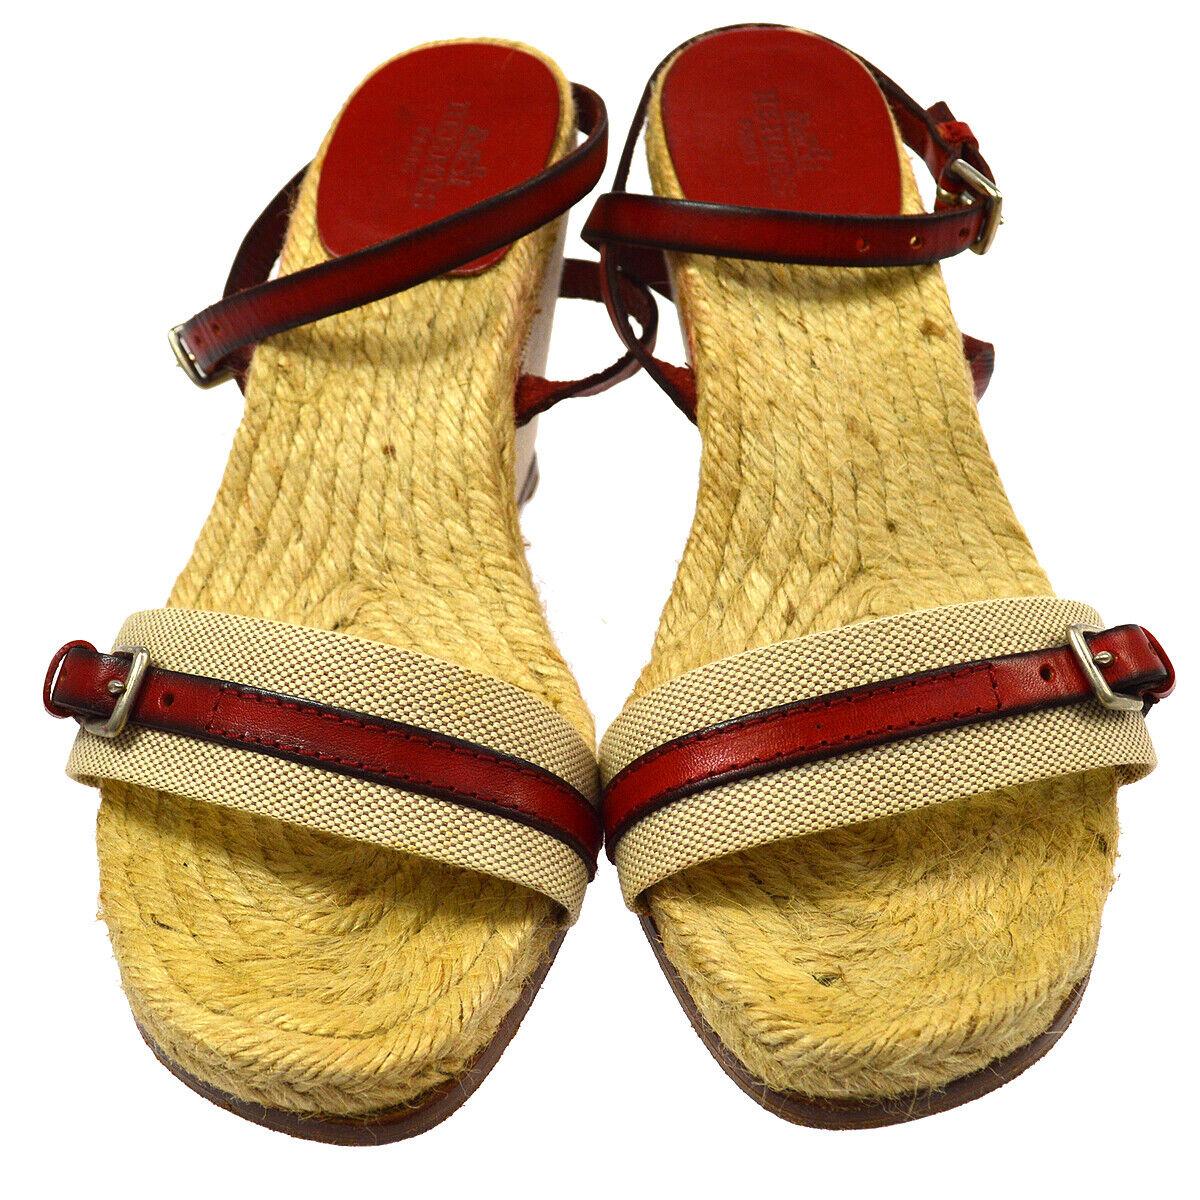 Autentici ERMES Logos Sandals scarpe Beige rosso Linen  Vintage \35; 37 AK29307  vendita di offerte